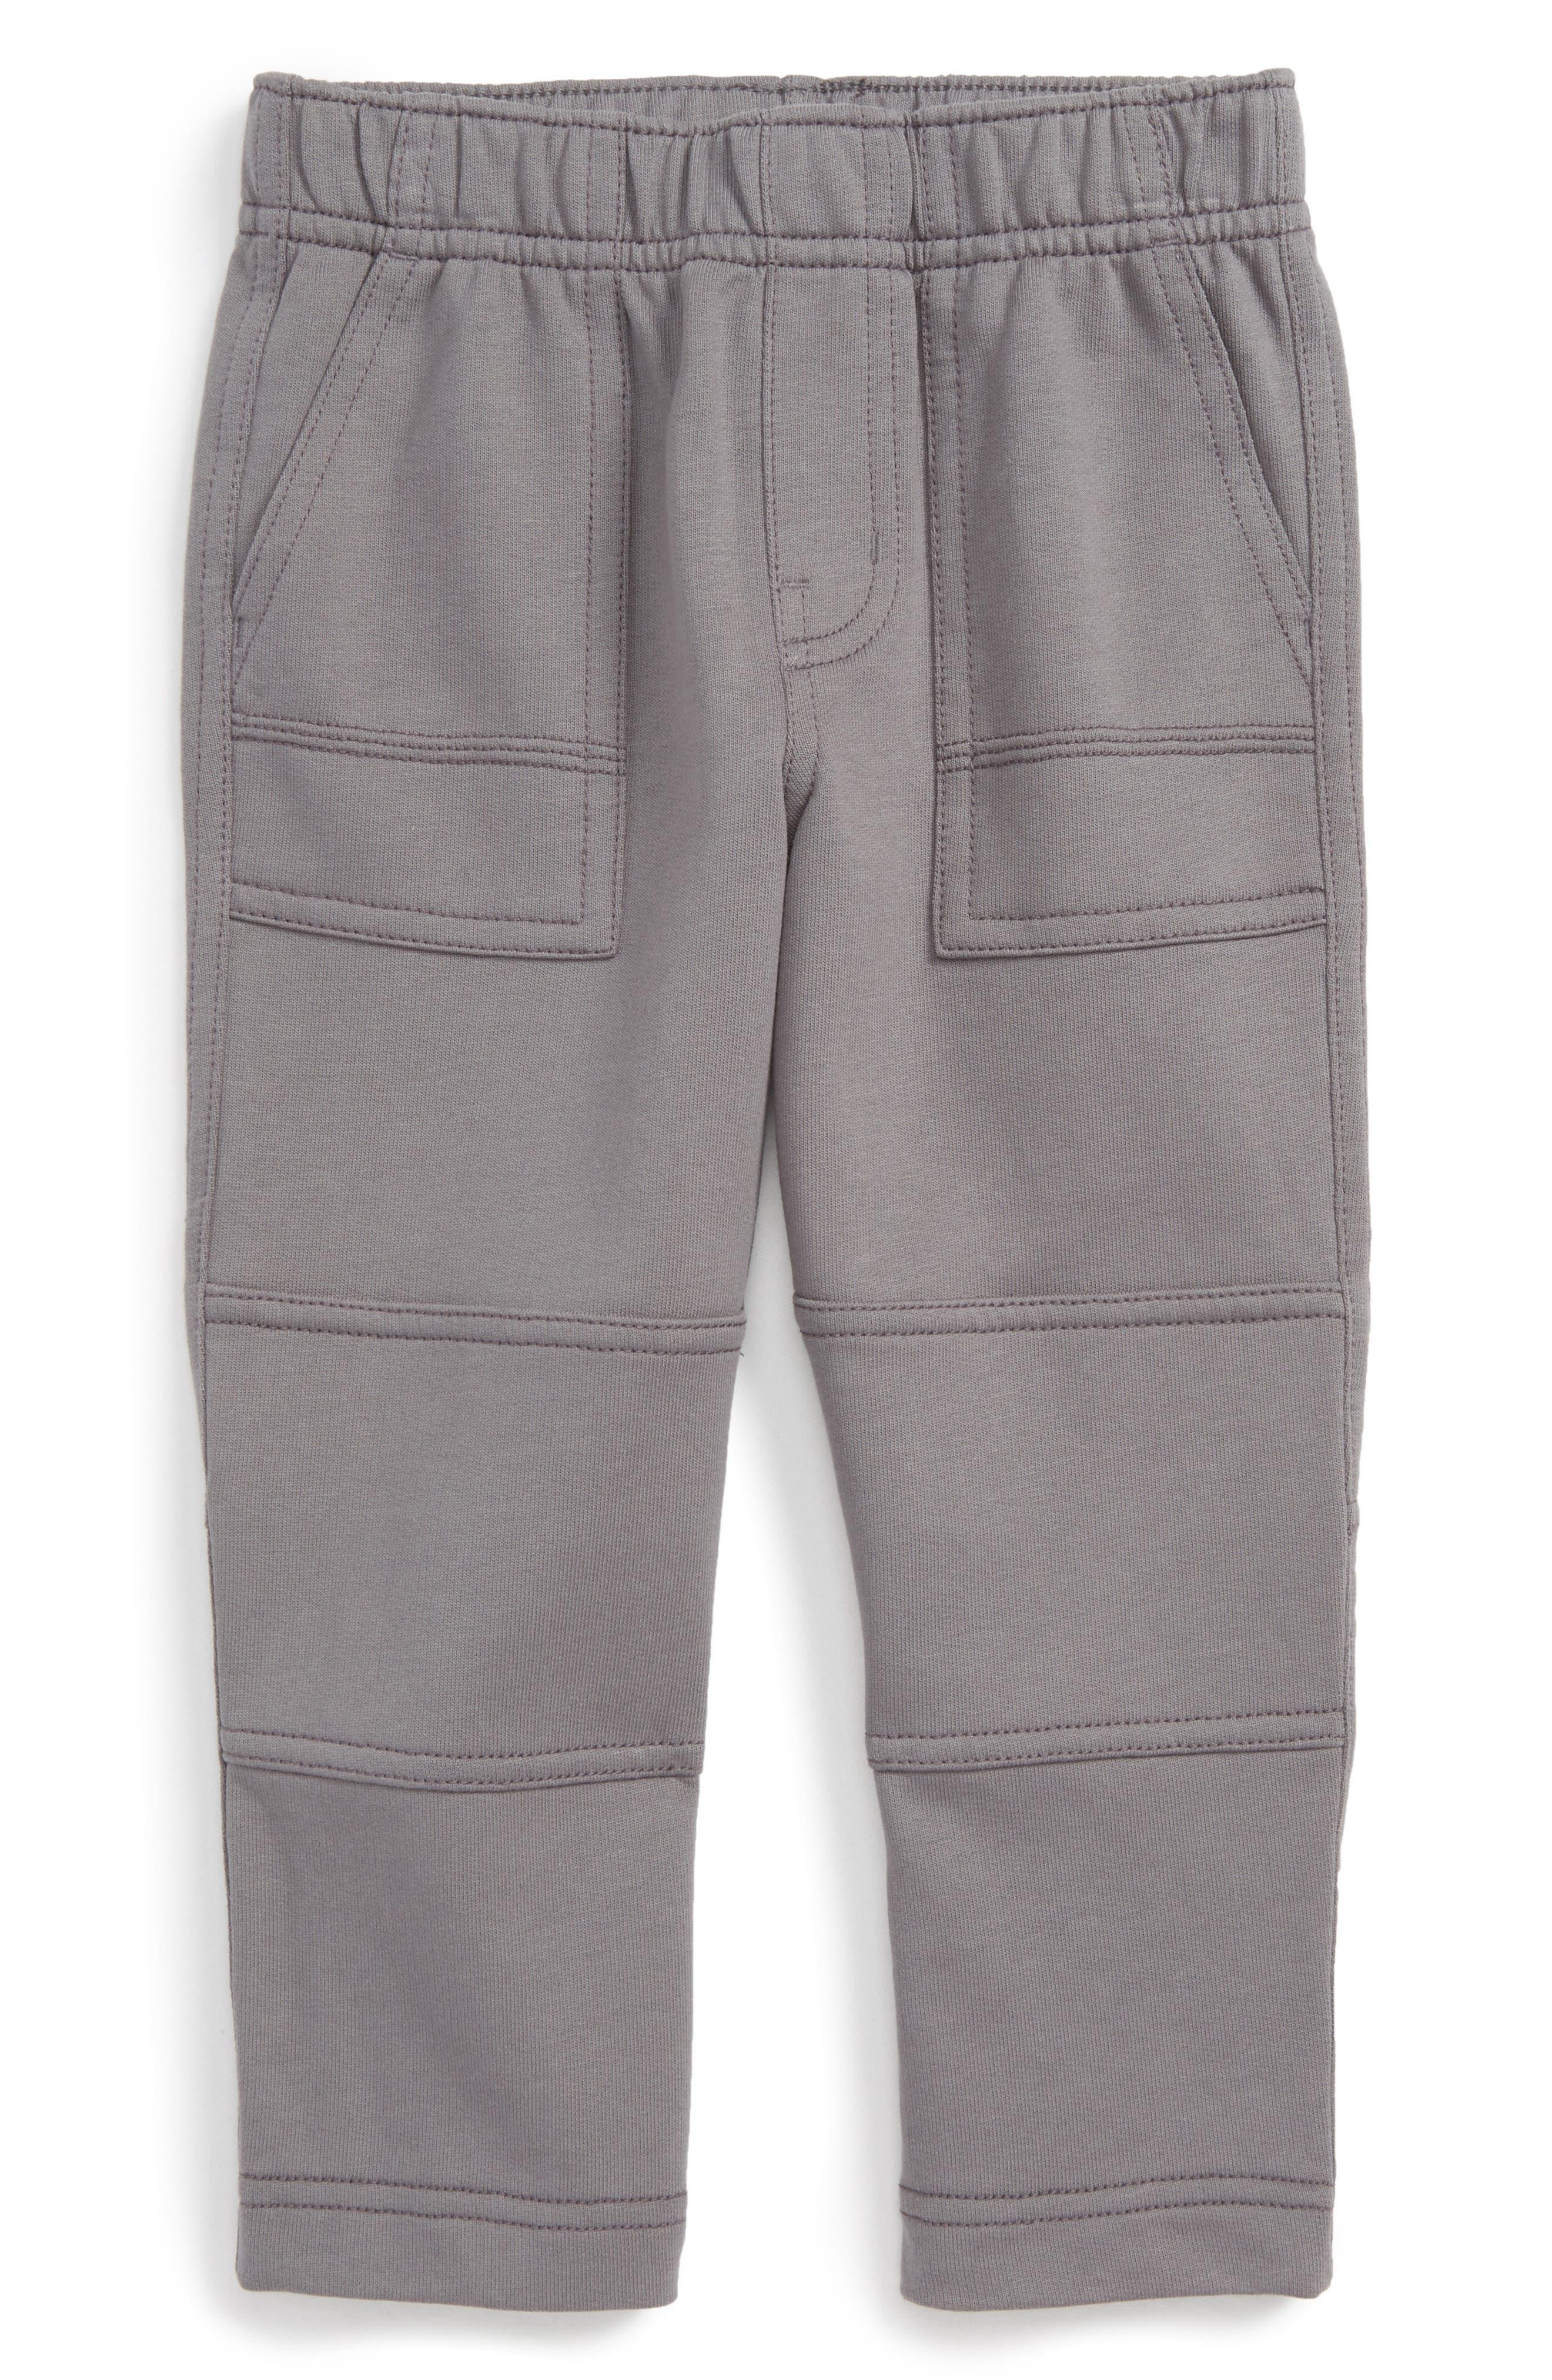 Knit Playwear Pants,                             Main thumbnail 1, color,                             Thunder